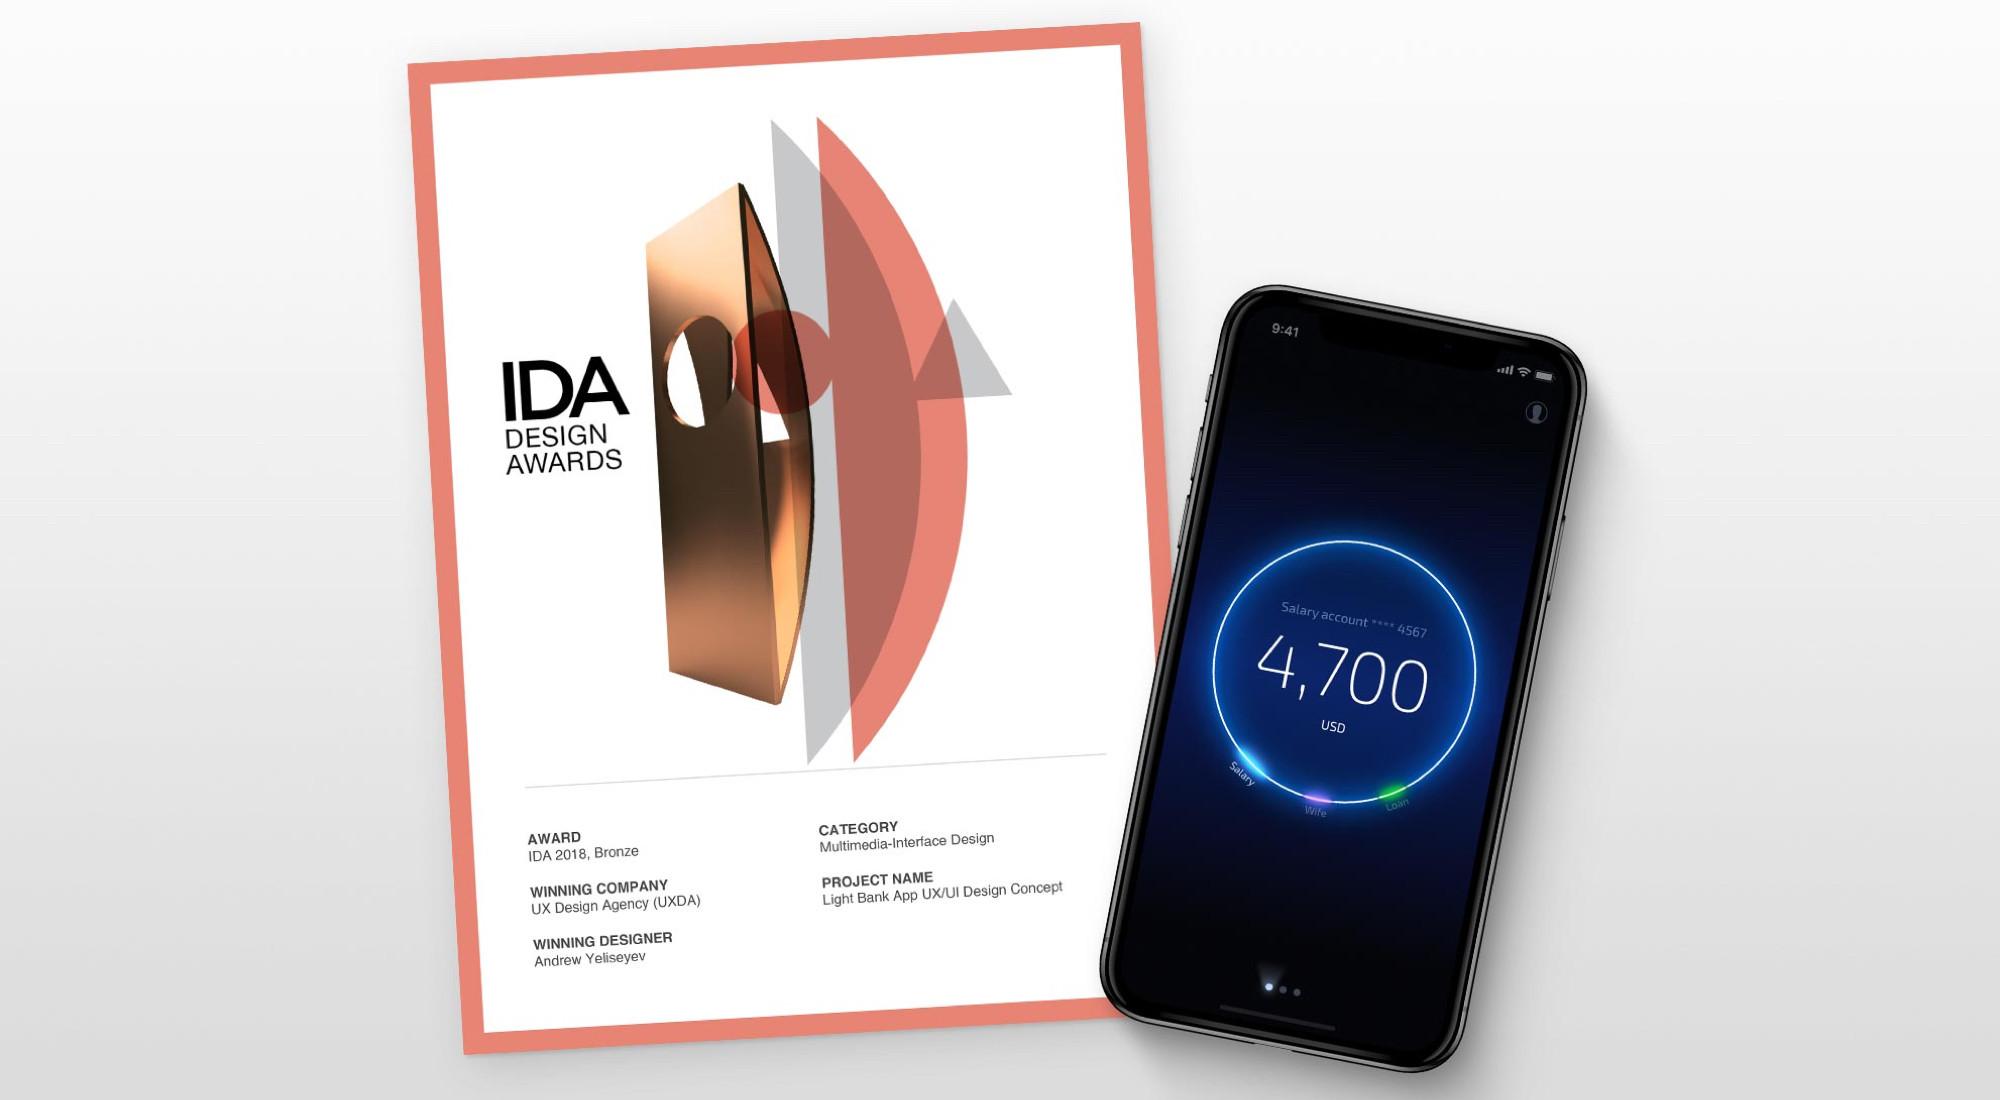 Financial UX Design Agency (UXDA) Receives the Prestigious International Design Award